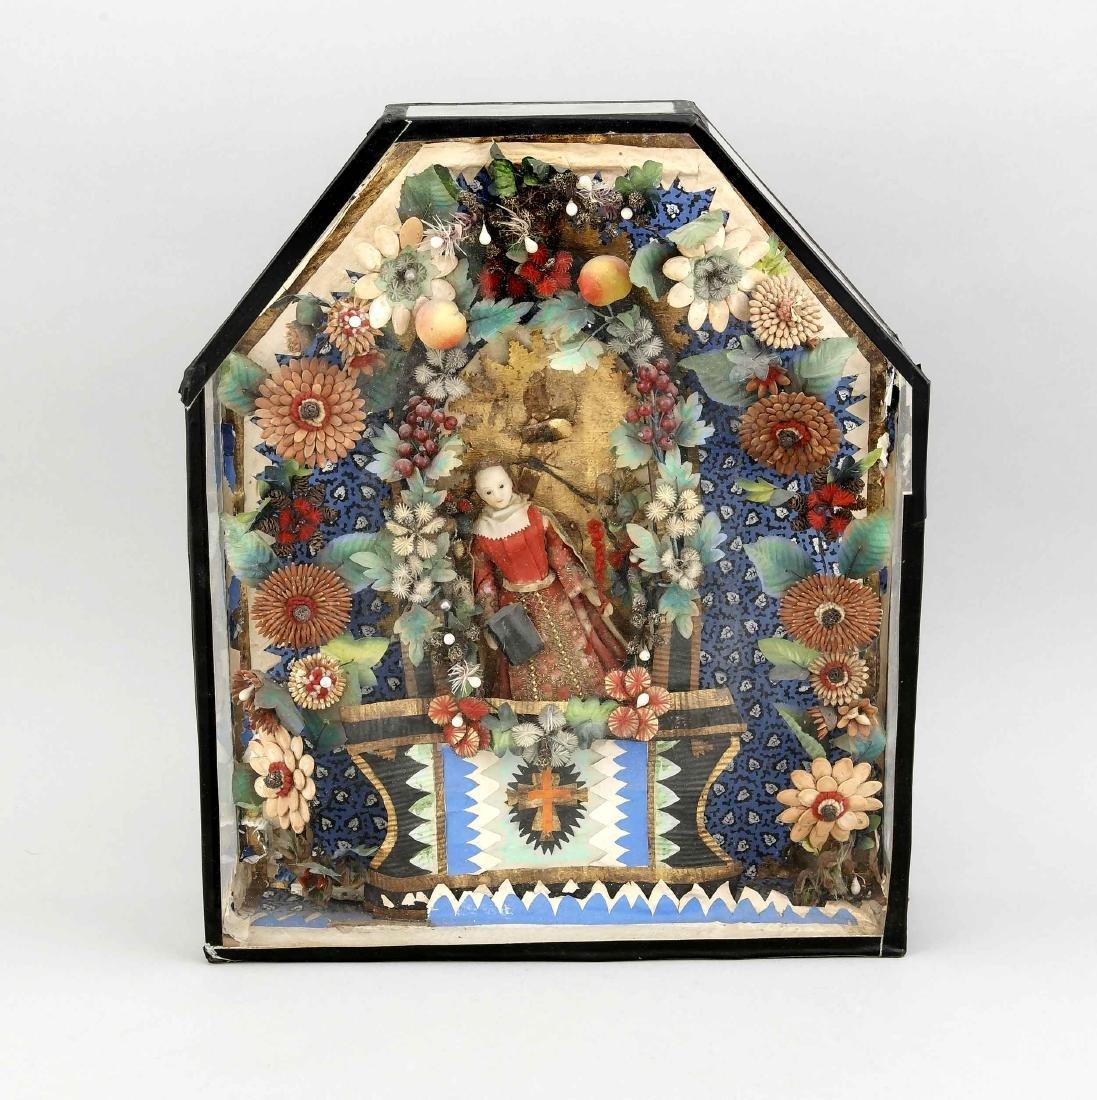 Religious folk art of the 19th century, Koster work,